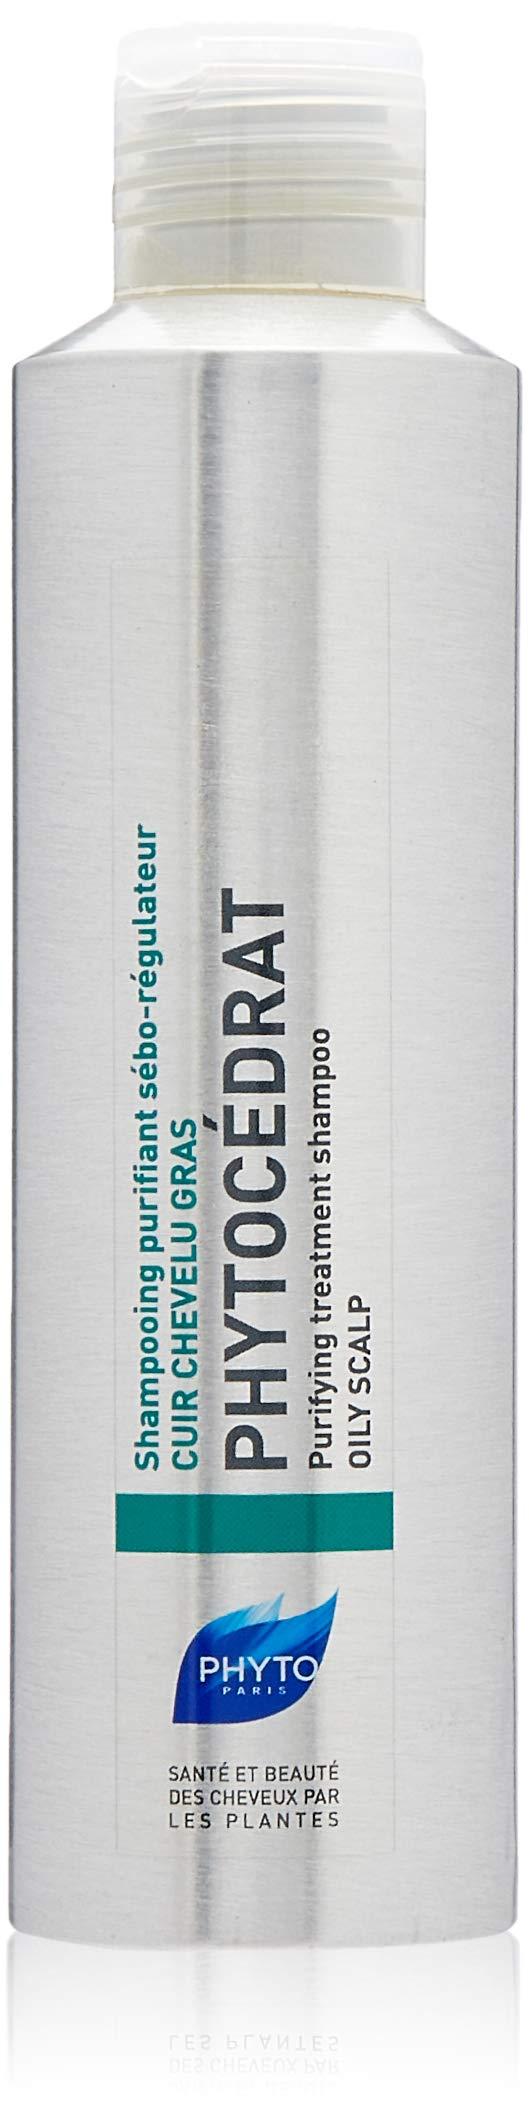 PHYTOCEDRAT Botanical Purifying Treatment Shampoo, 6.7 fl oz by PHYTO